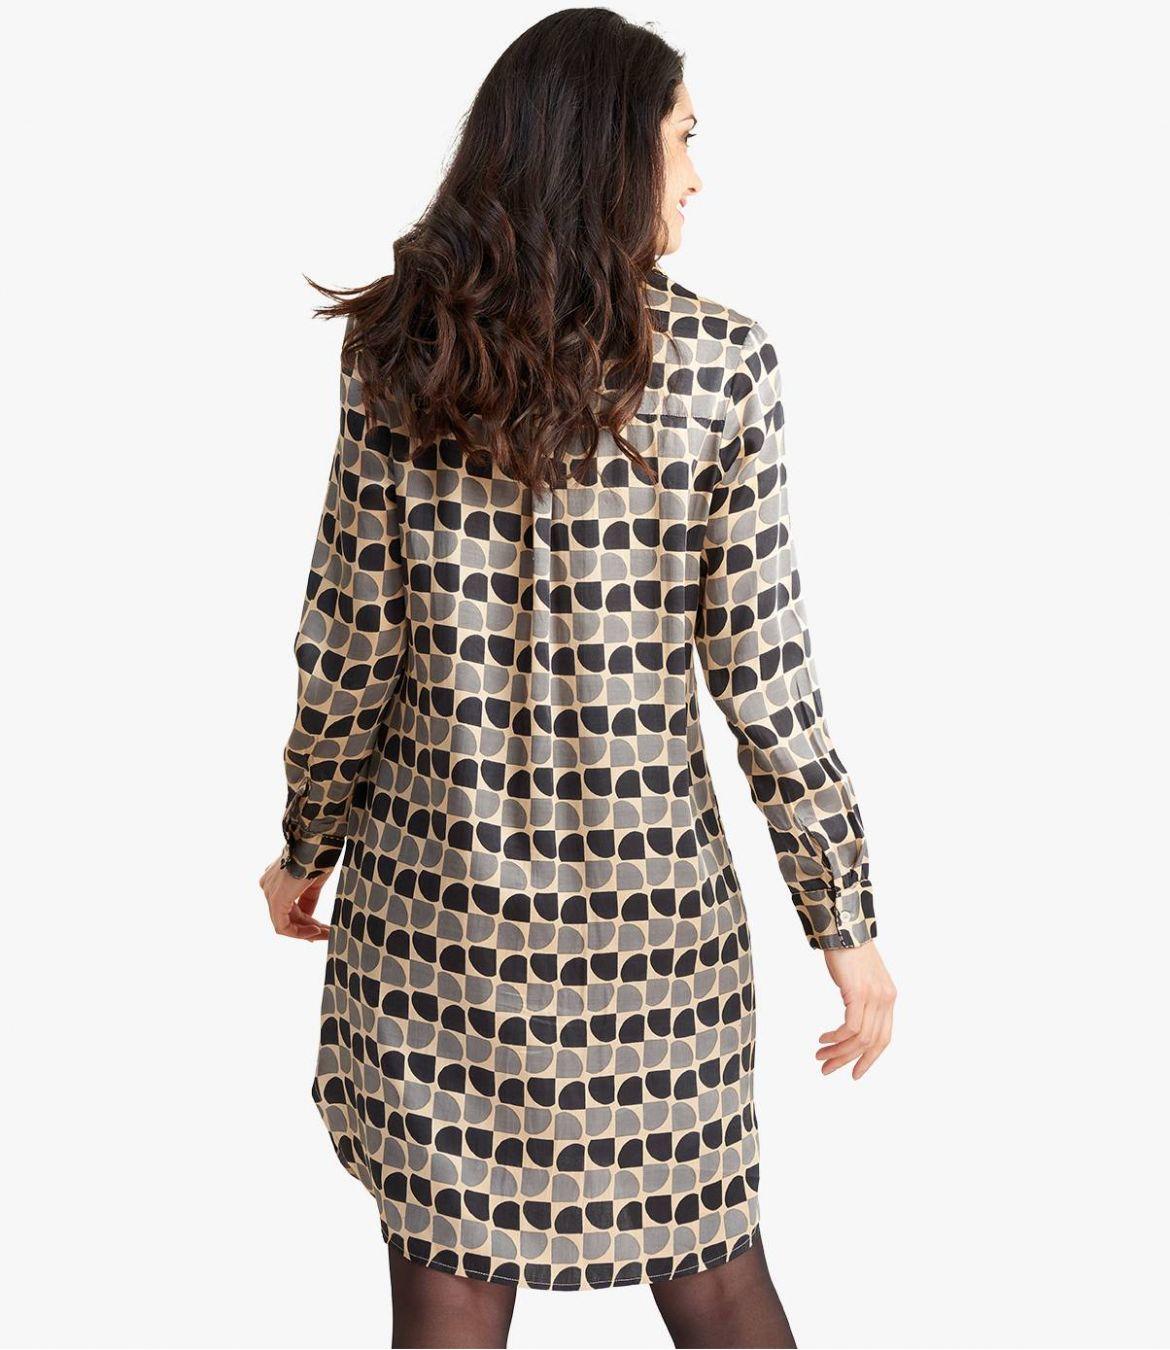 KAIA ARTY Robe en Modal satin pour Femme - 7